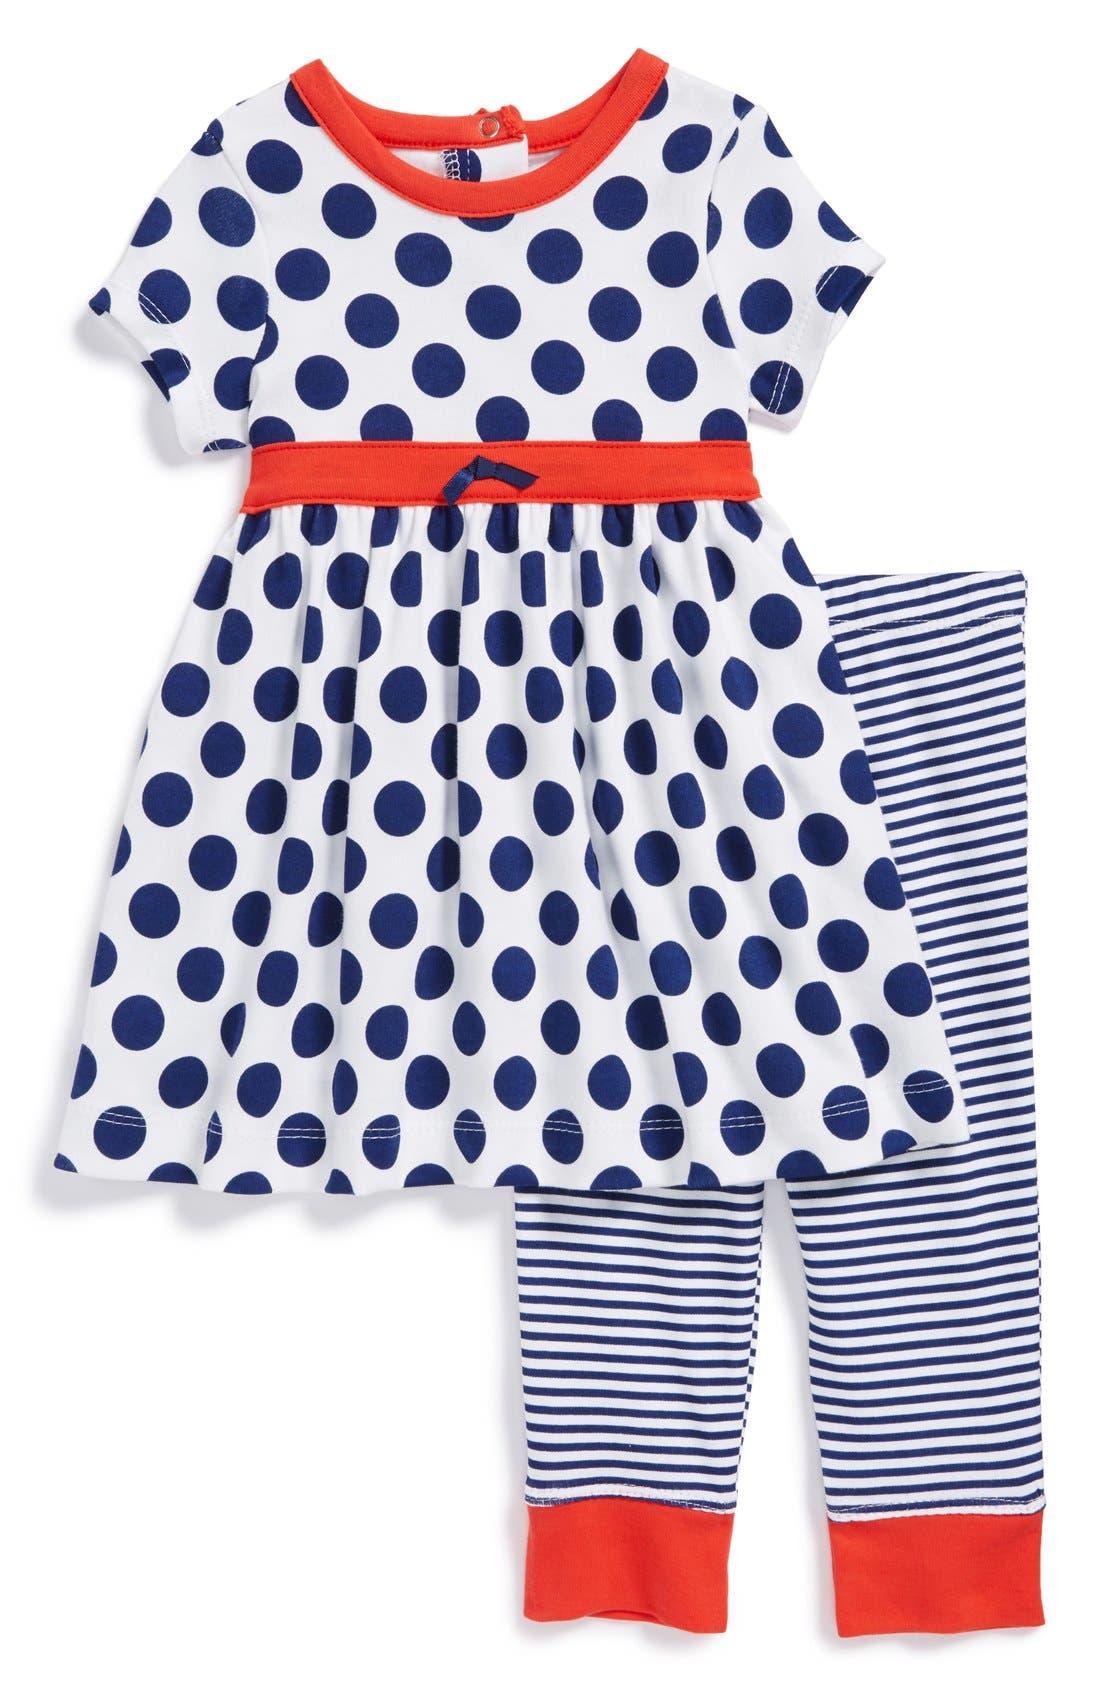 Main Image - Offspring 'Polka Dot' Dress & Leggings (Baby Girls)